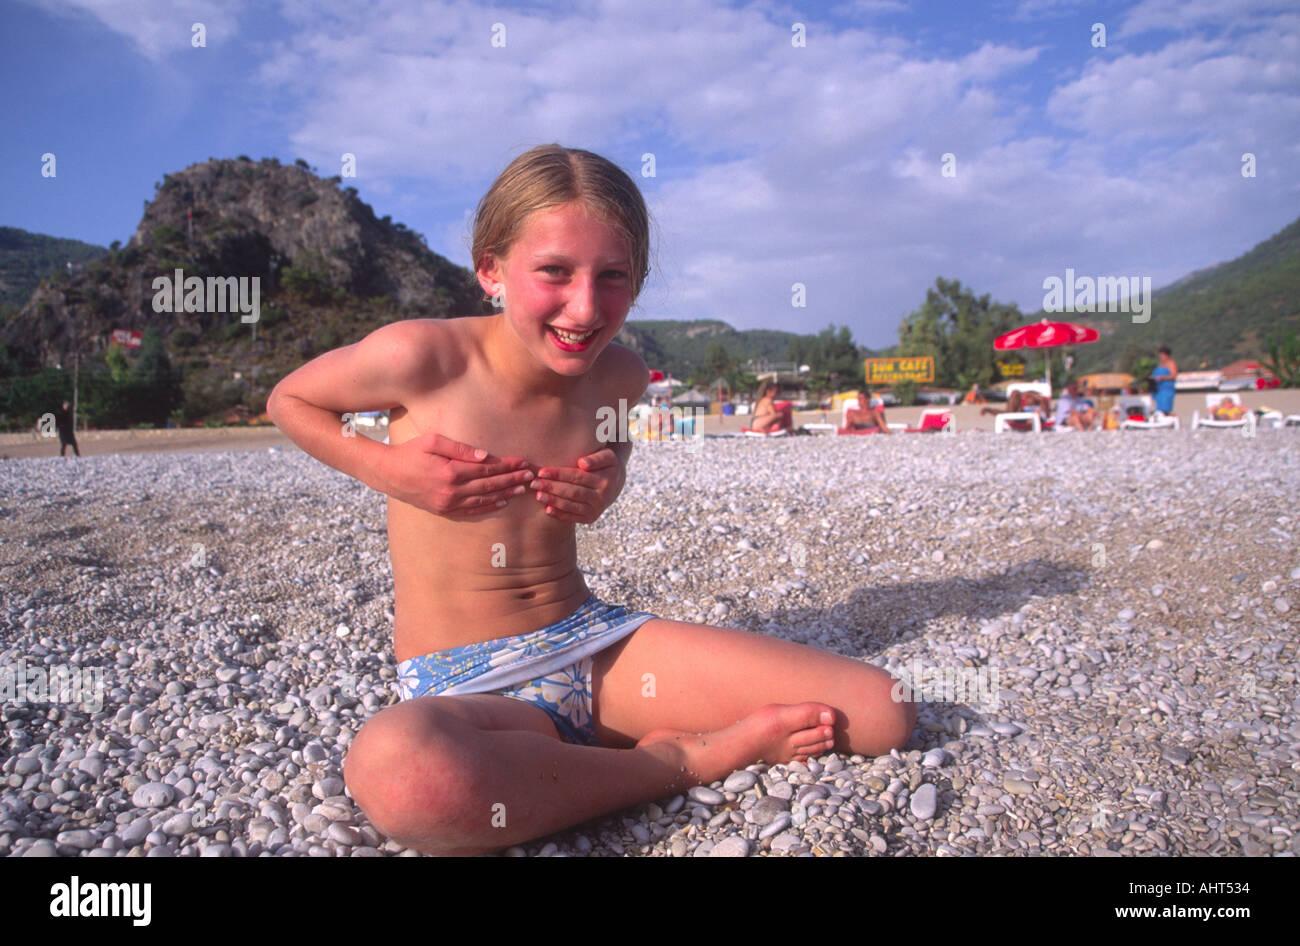 Jennifer nude blowjob lopez sexy